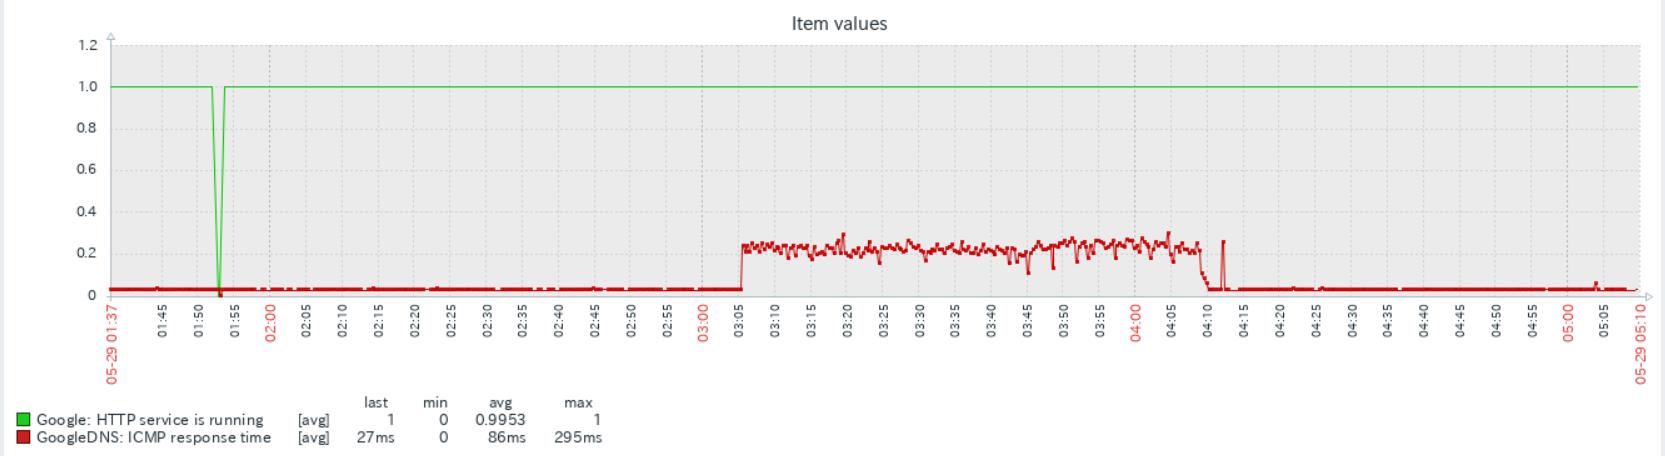 zabbix5 でインターネットの疎通、監視、リモートワーク時代の「ネットが遅い」をチェック_a0056607_12271394.png